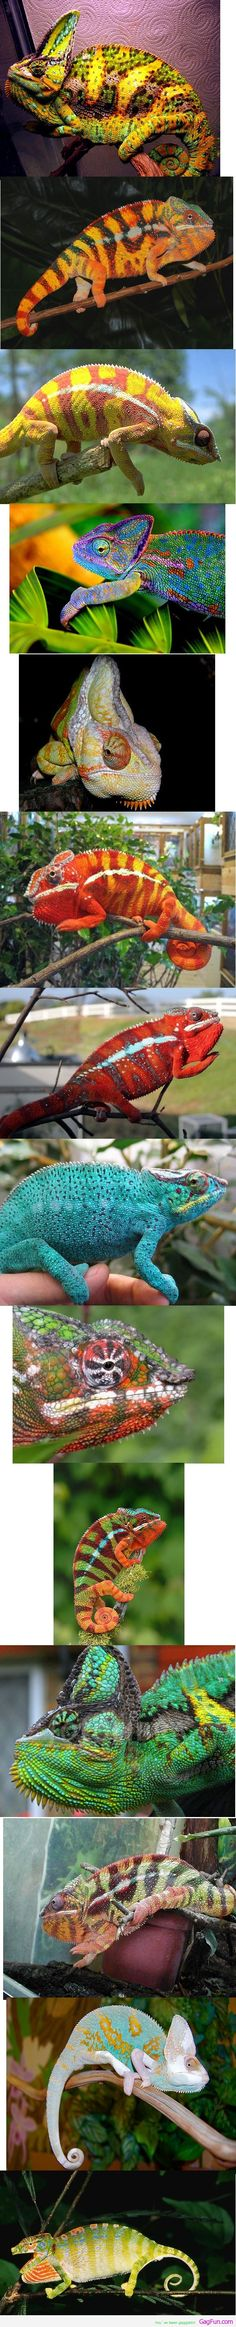 14 Colorful chameleons